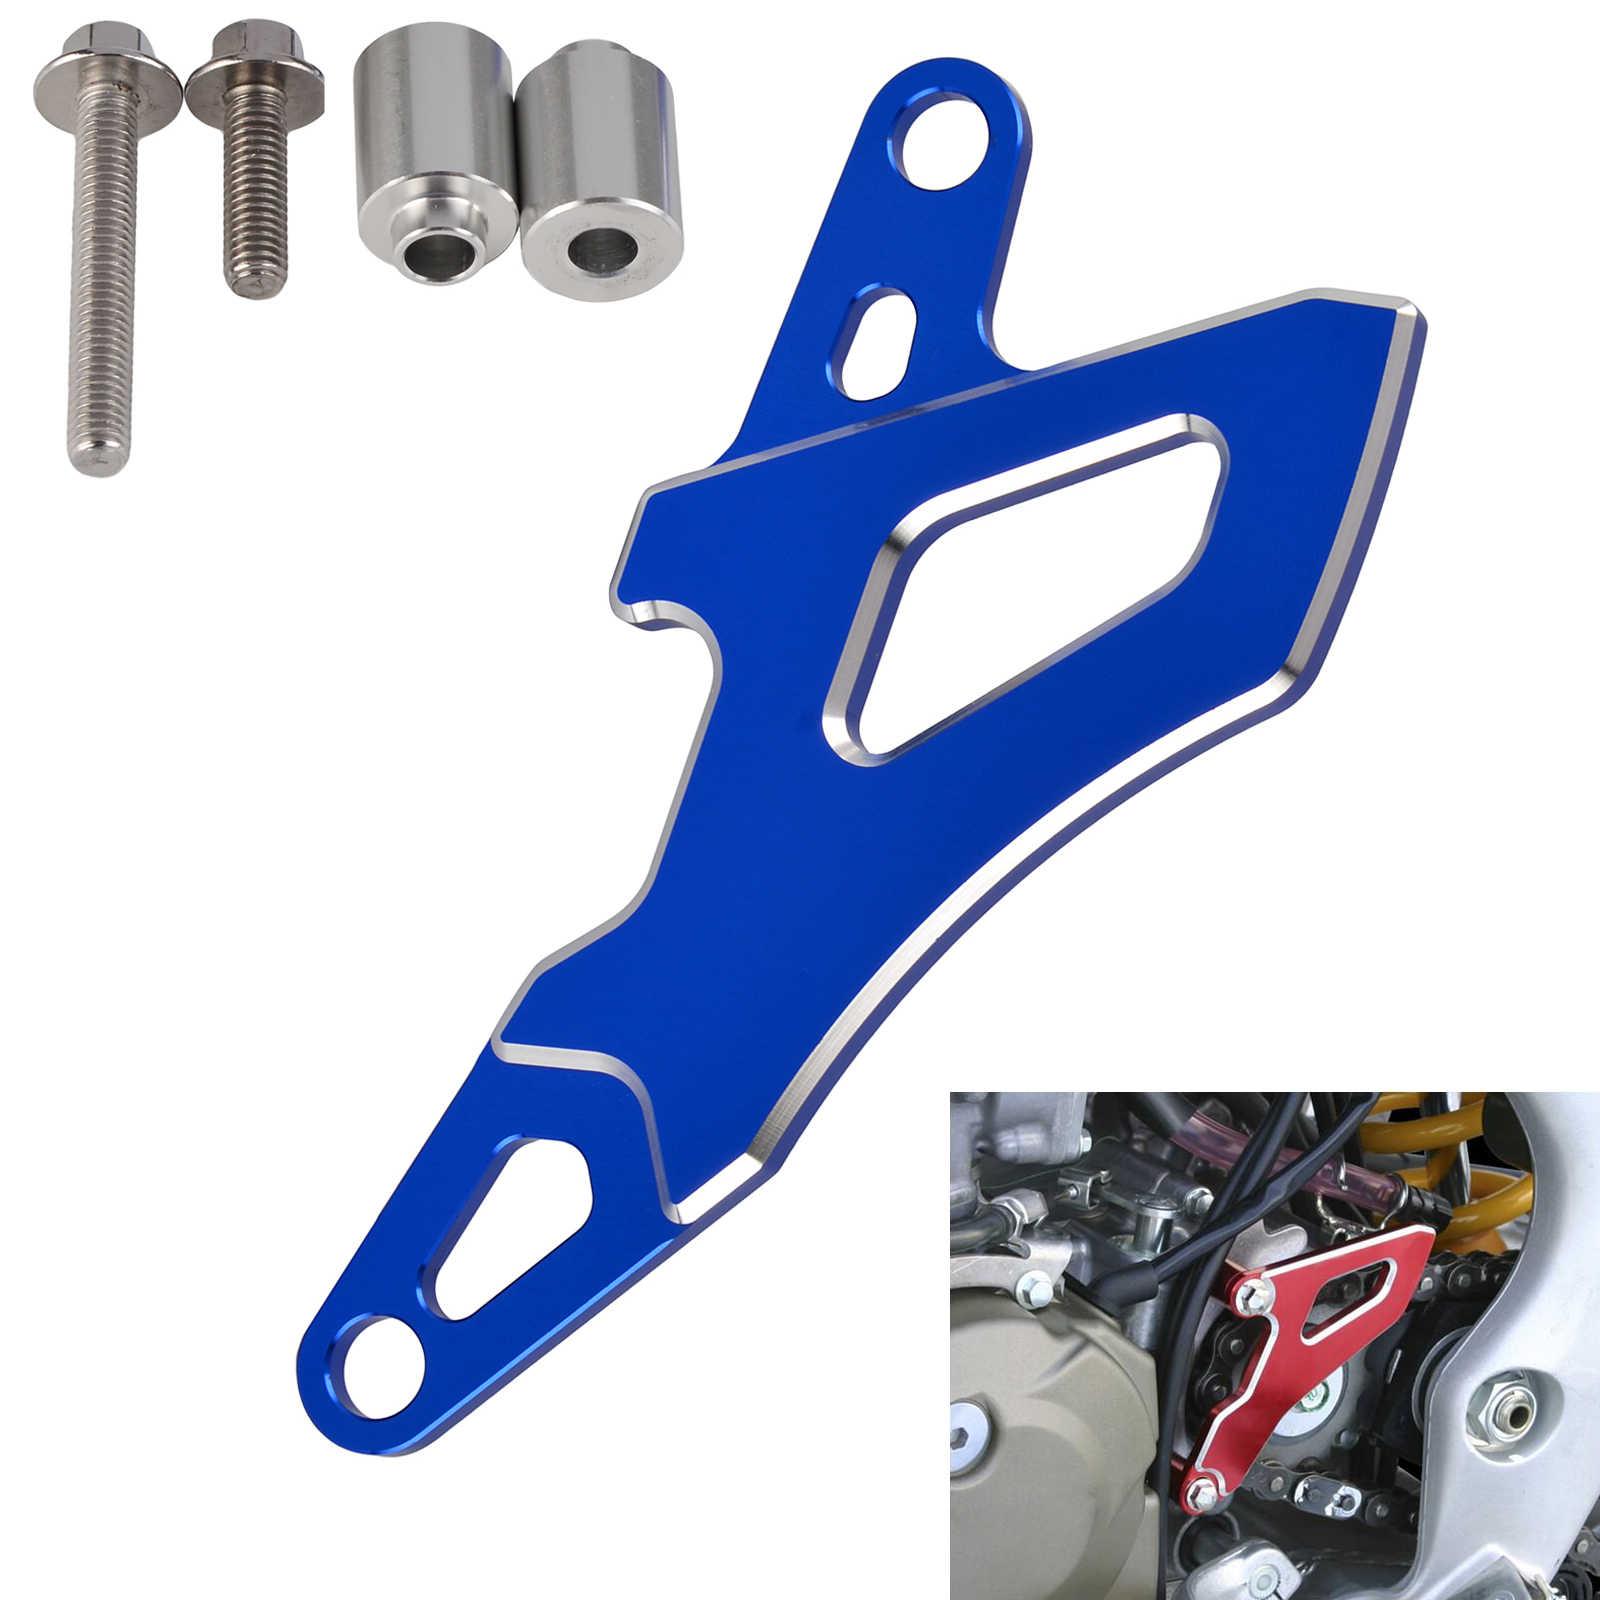 Motorcycle Engine Plate Saver Case Saver Engine Guard For Yamaha YZ125 YZ125X YZ 125 2006-2019 YZ 125X 2017 2018 2019